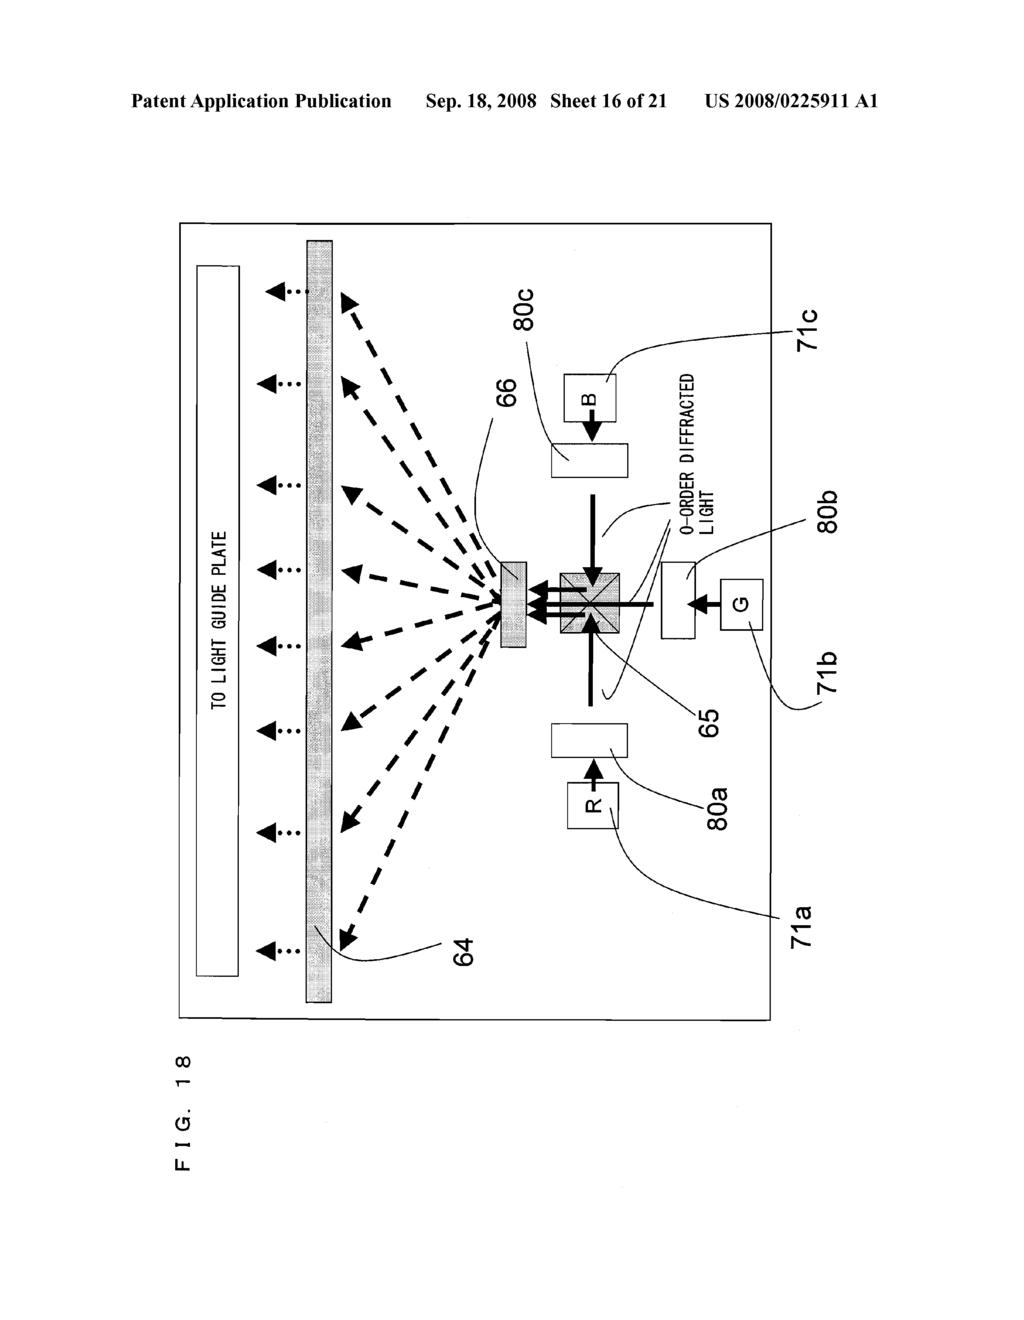 Laser Detector Schematic Wiring Data Opt301 Receiver Wavelength Stabilization Device And Rectifier